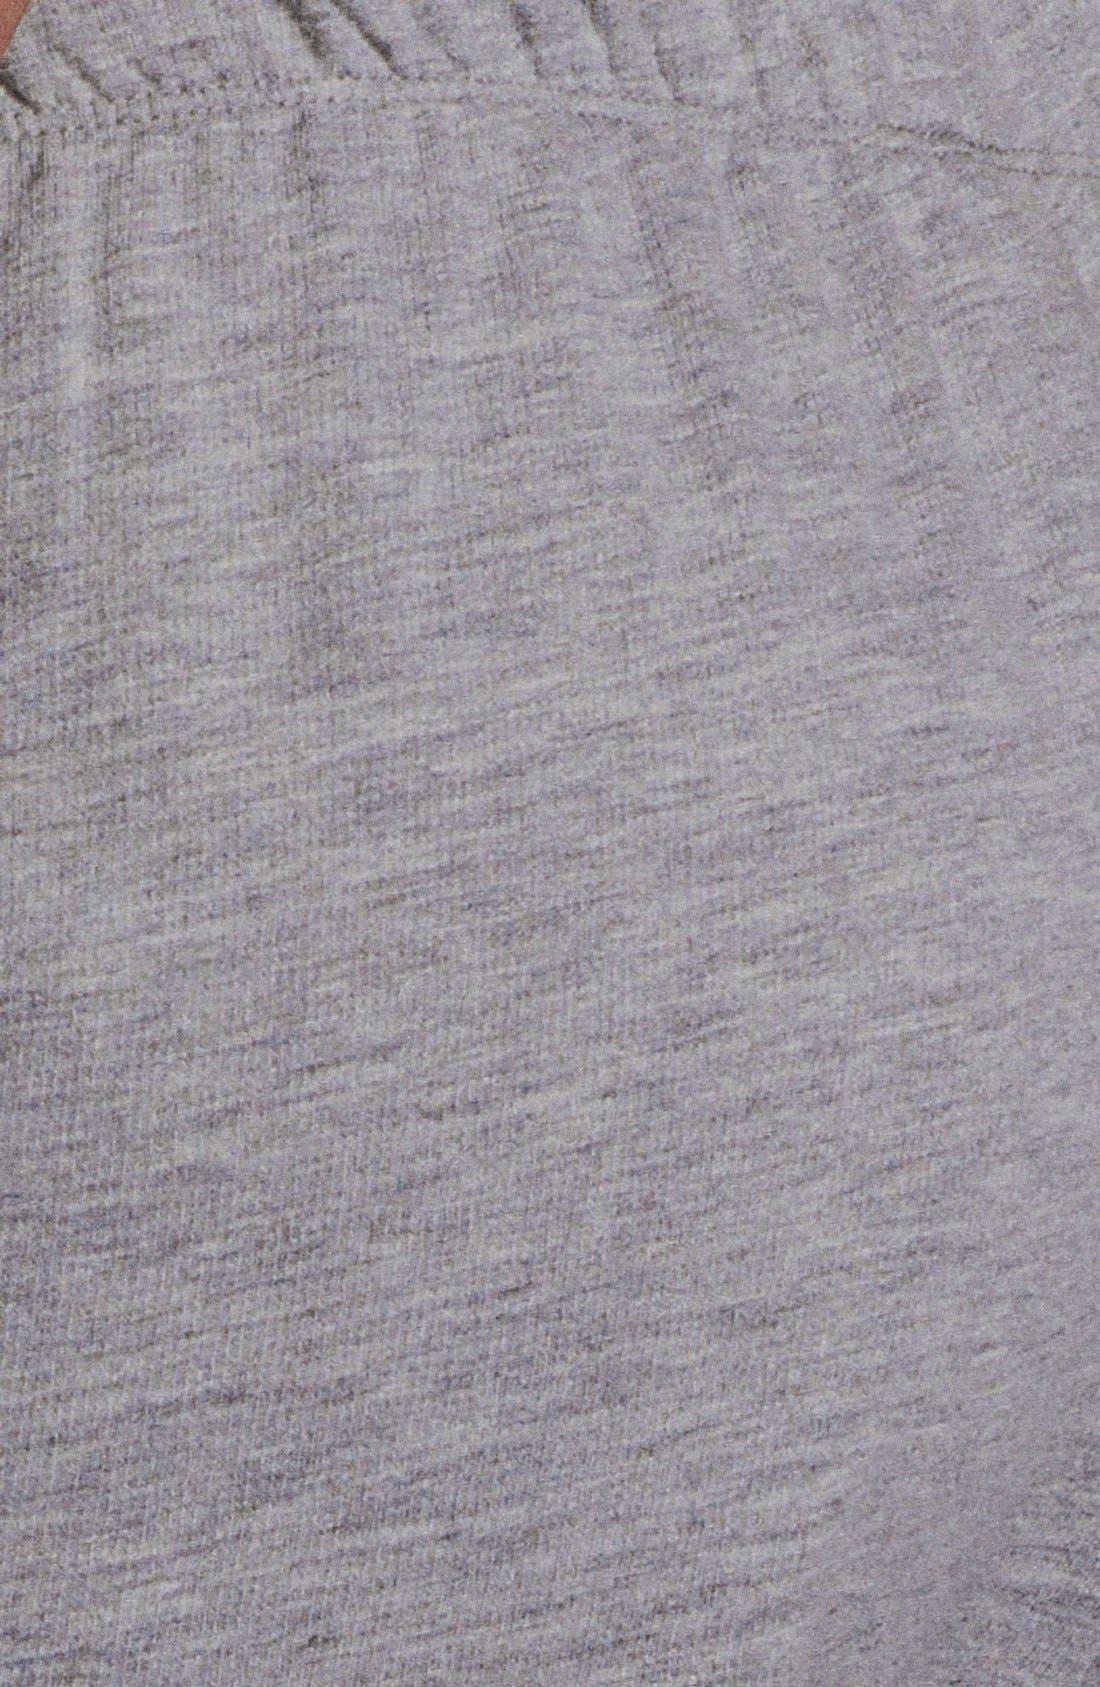 Alternate Image 3  - Make + Model 'Jogger' Fleece Pants